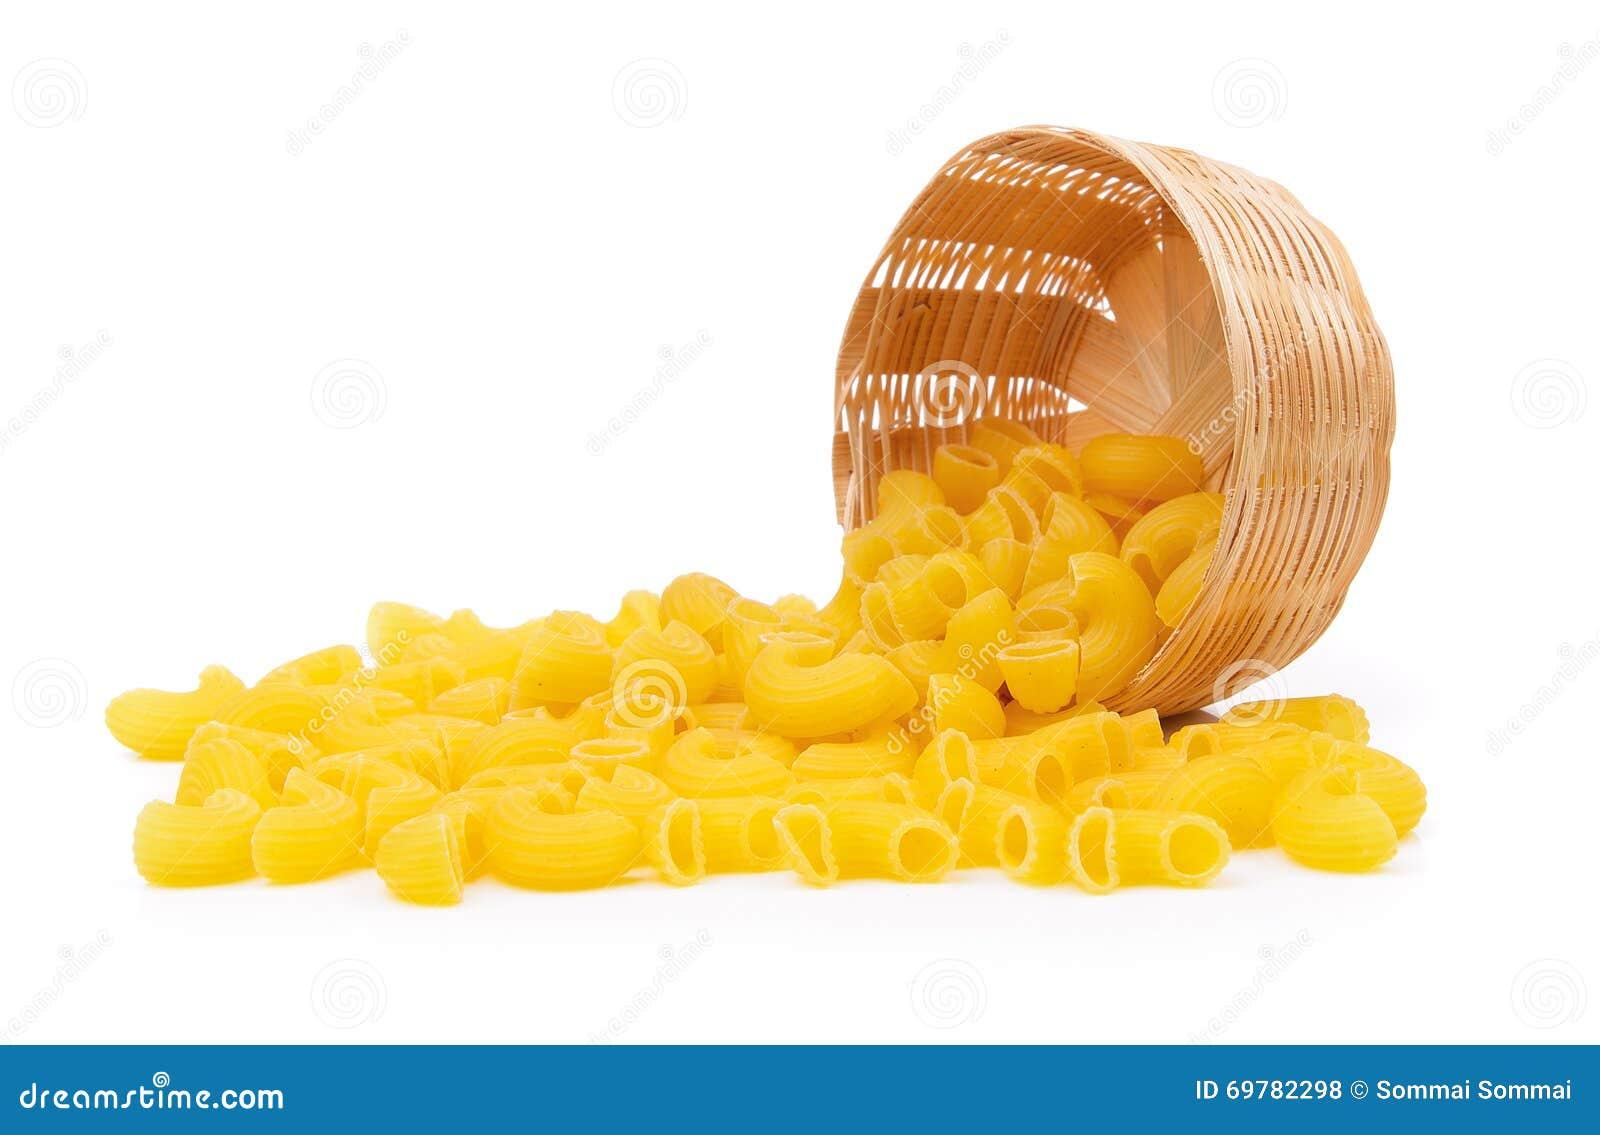 Dry macaroni in the basket